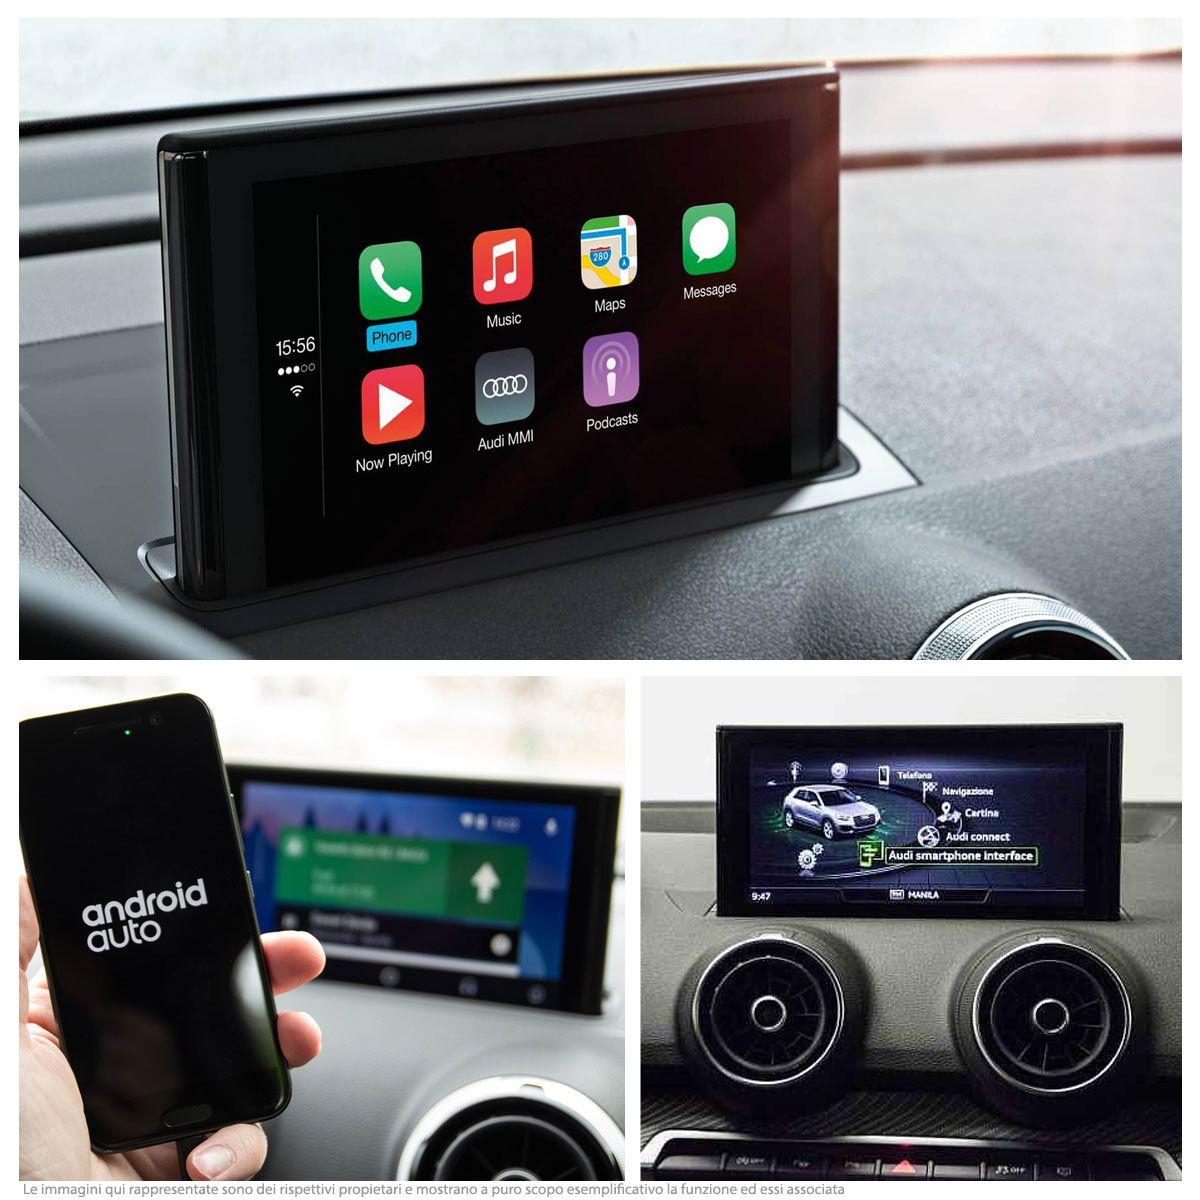 Audi Smartphone Interface - Retrofit - Audi A3 8V, Q2 GA